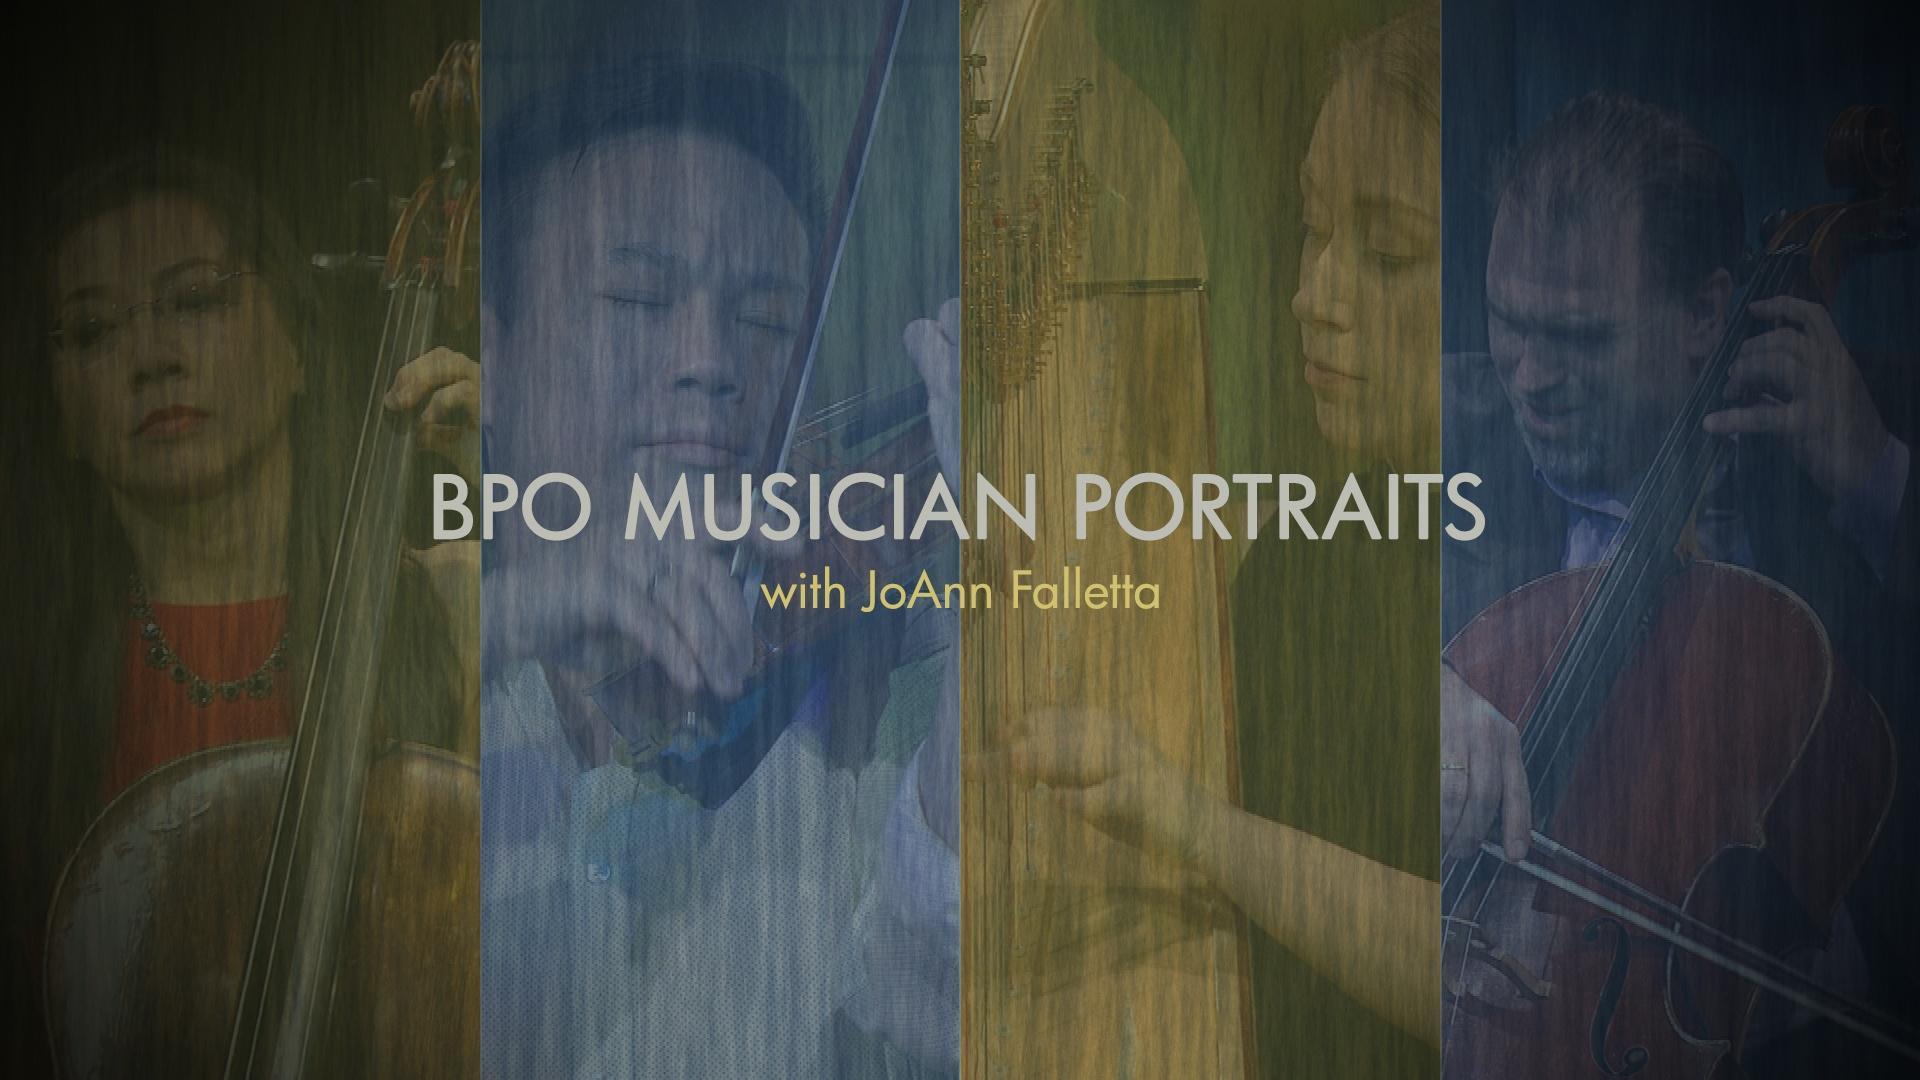 BPO Musican Portraits